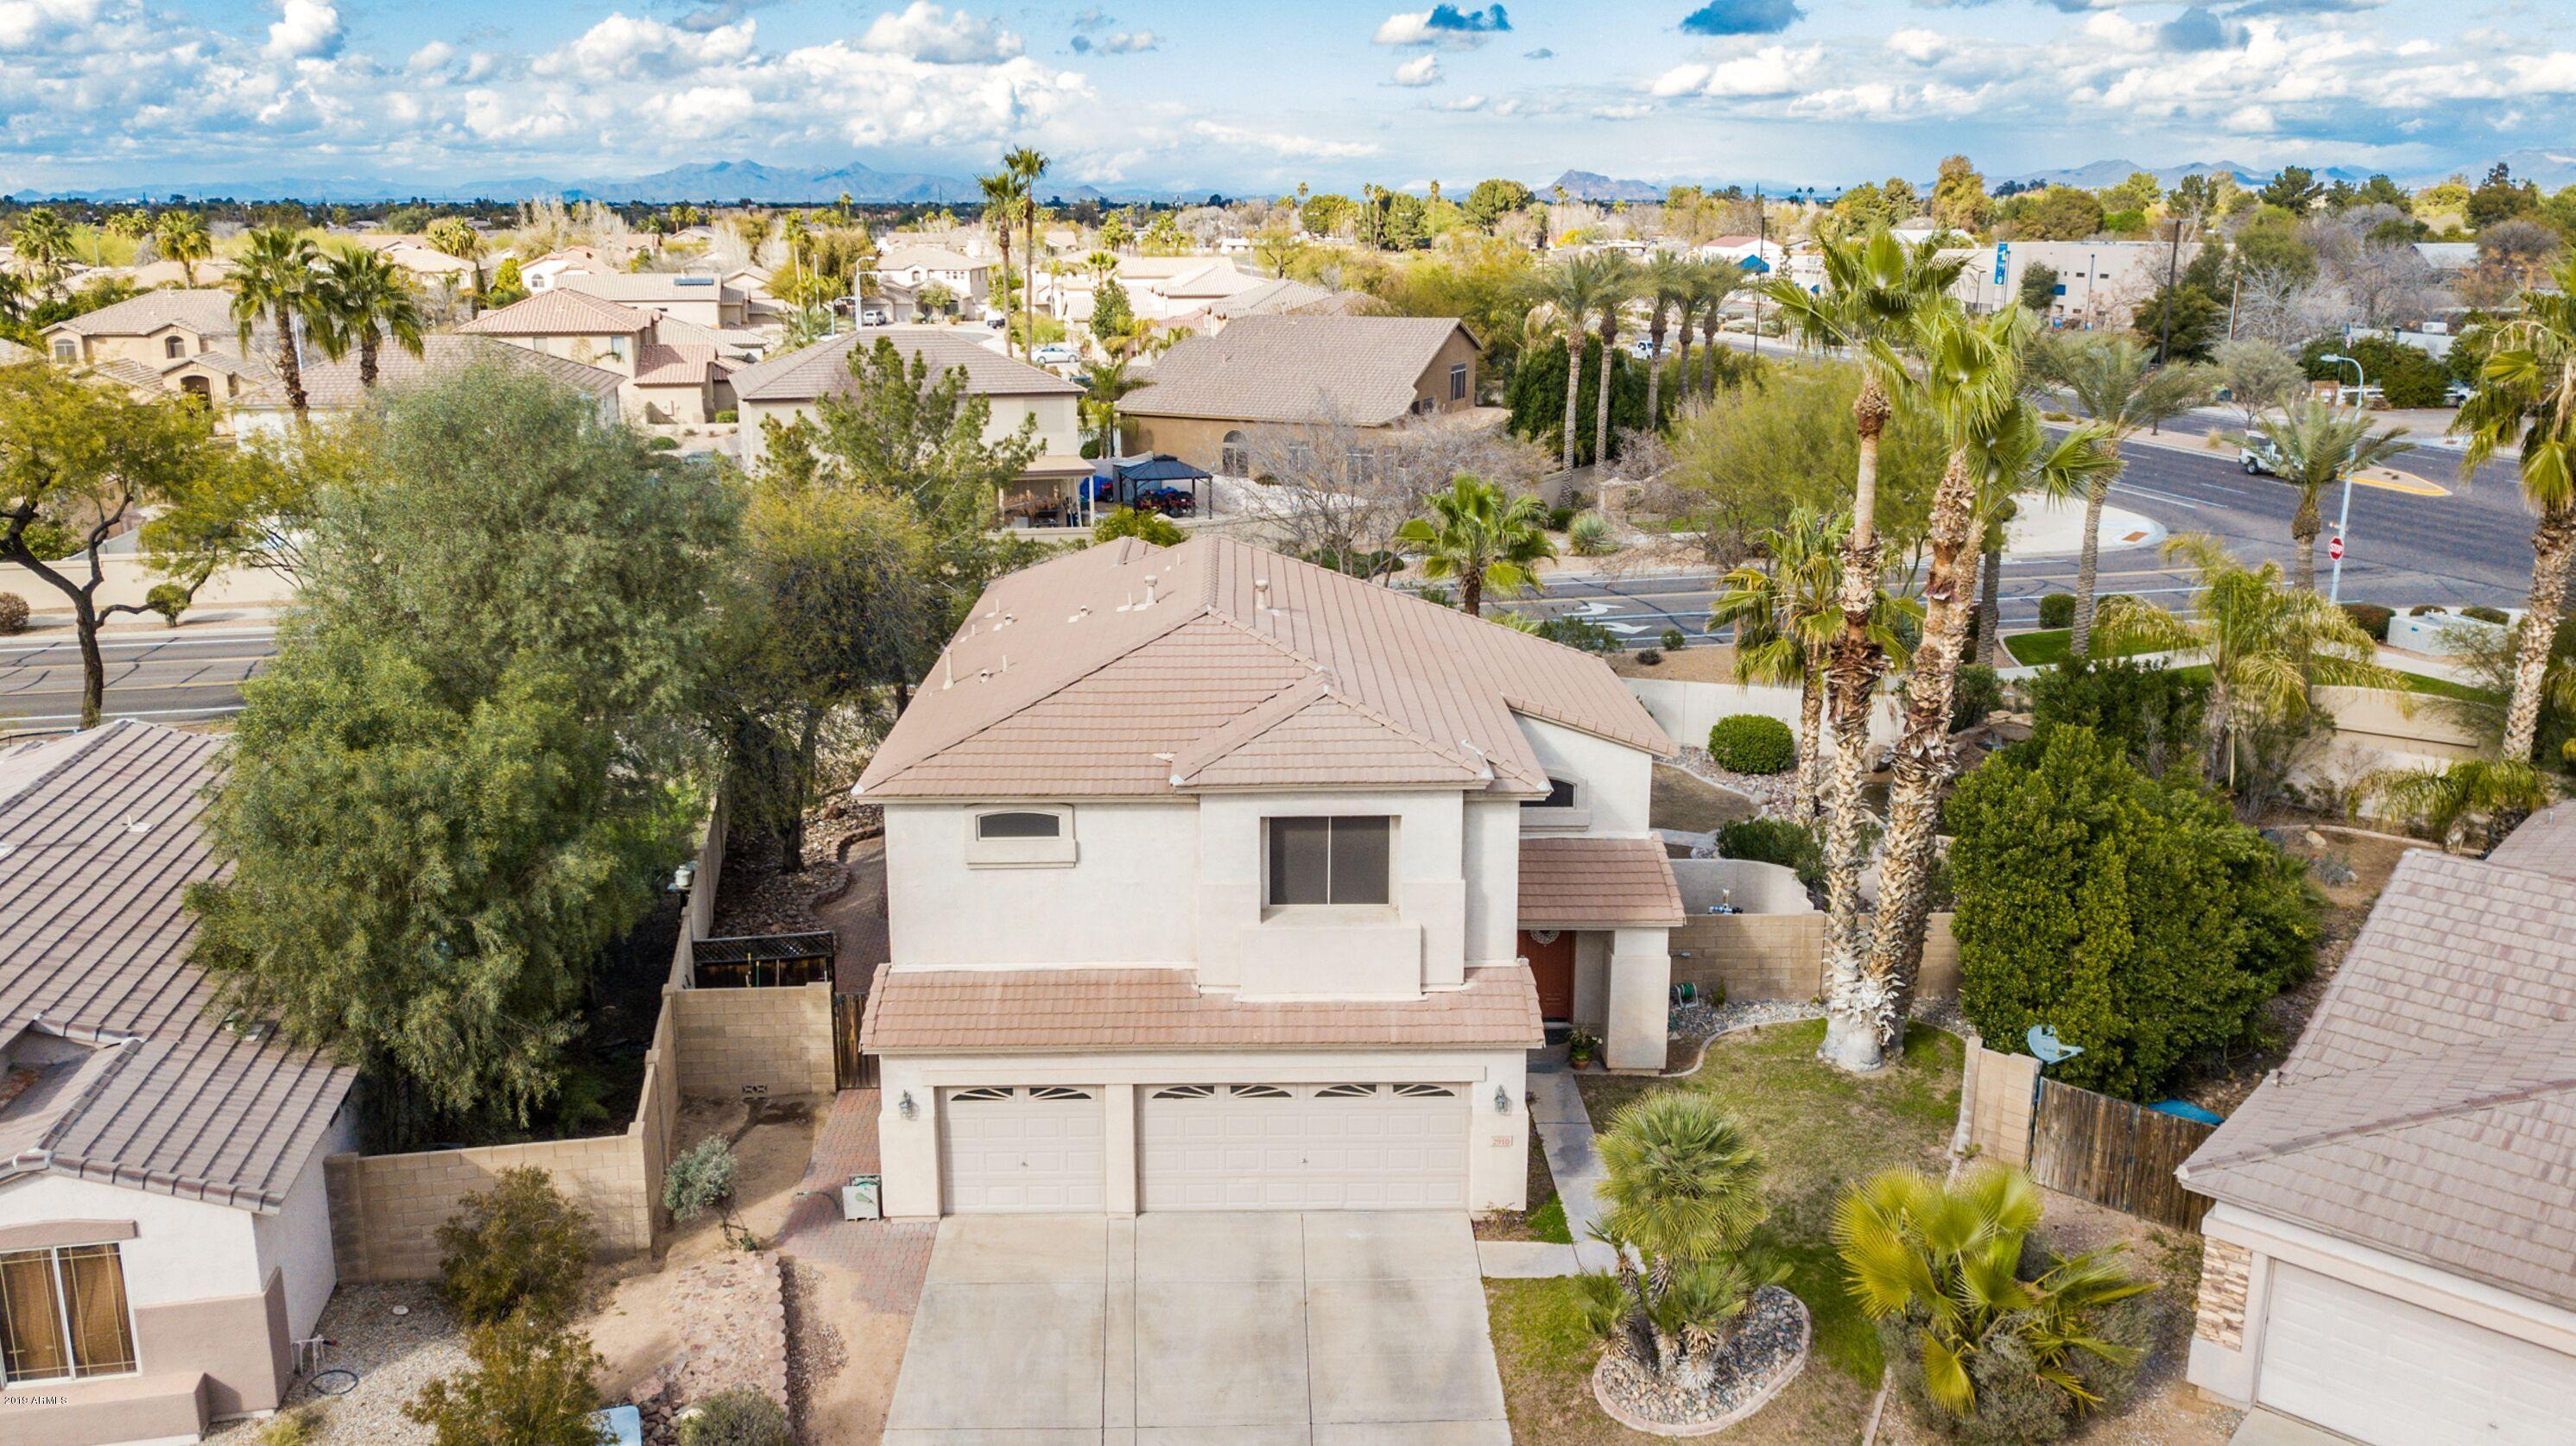 Photo of 2910 E CARLA VISTA Drive, Chandler, AZ 85225